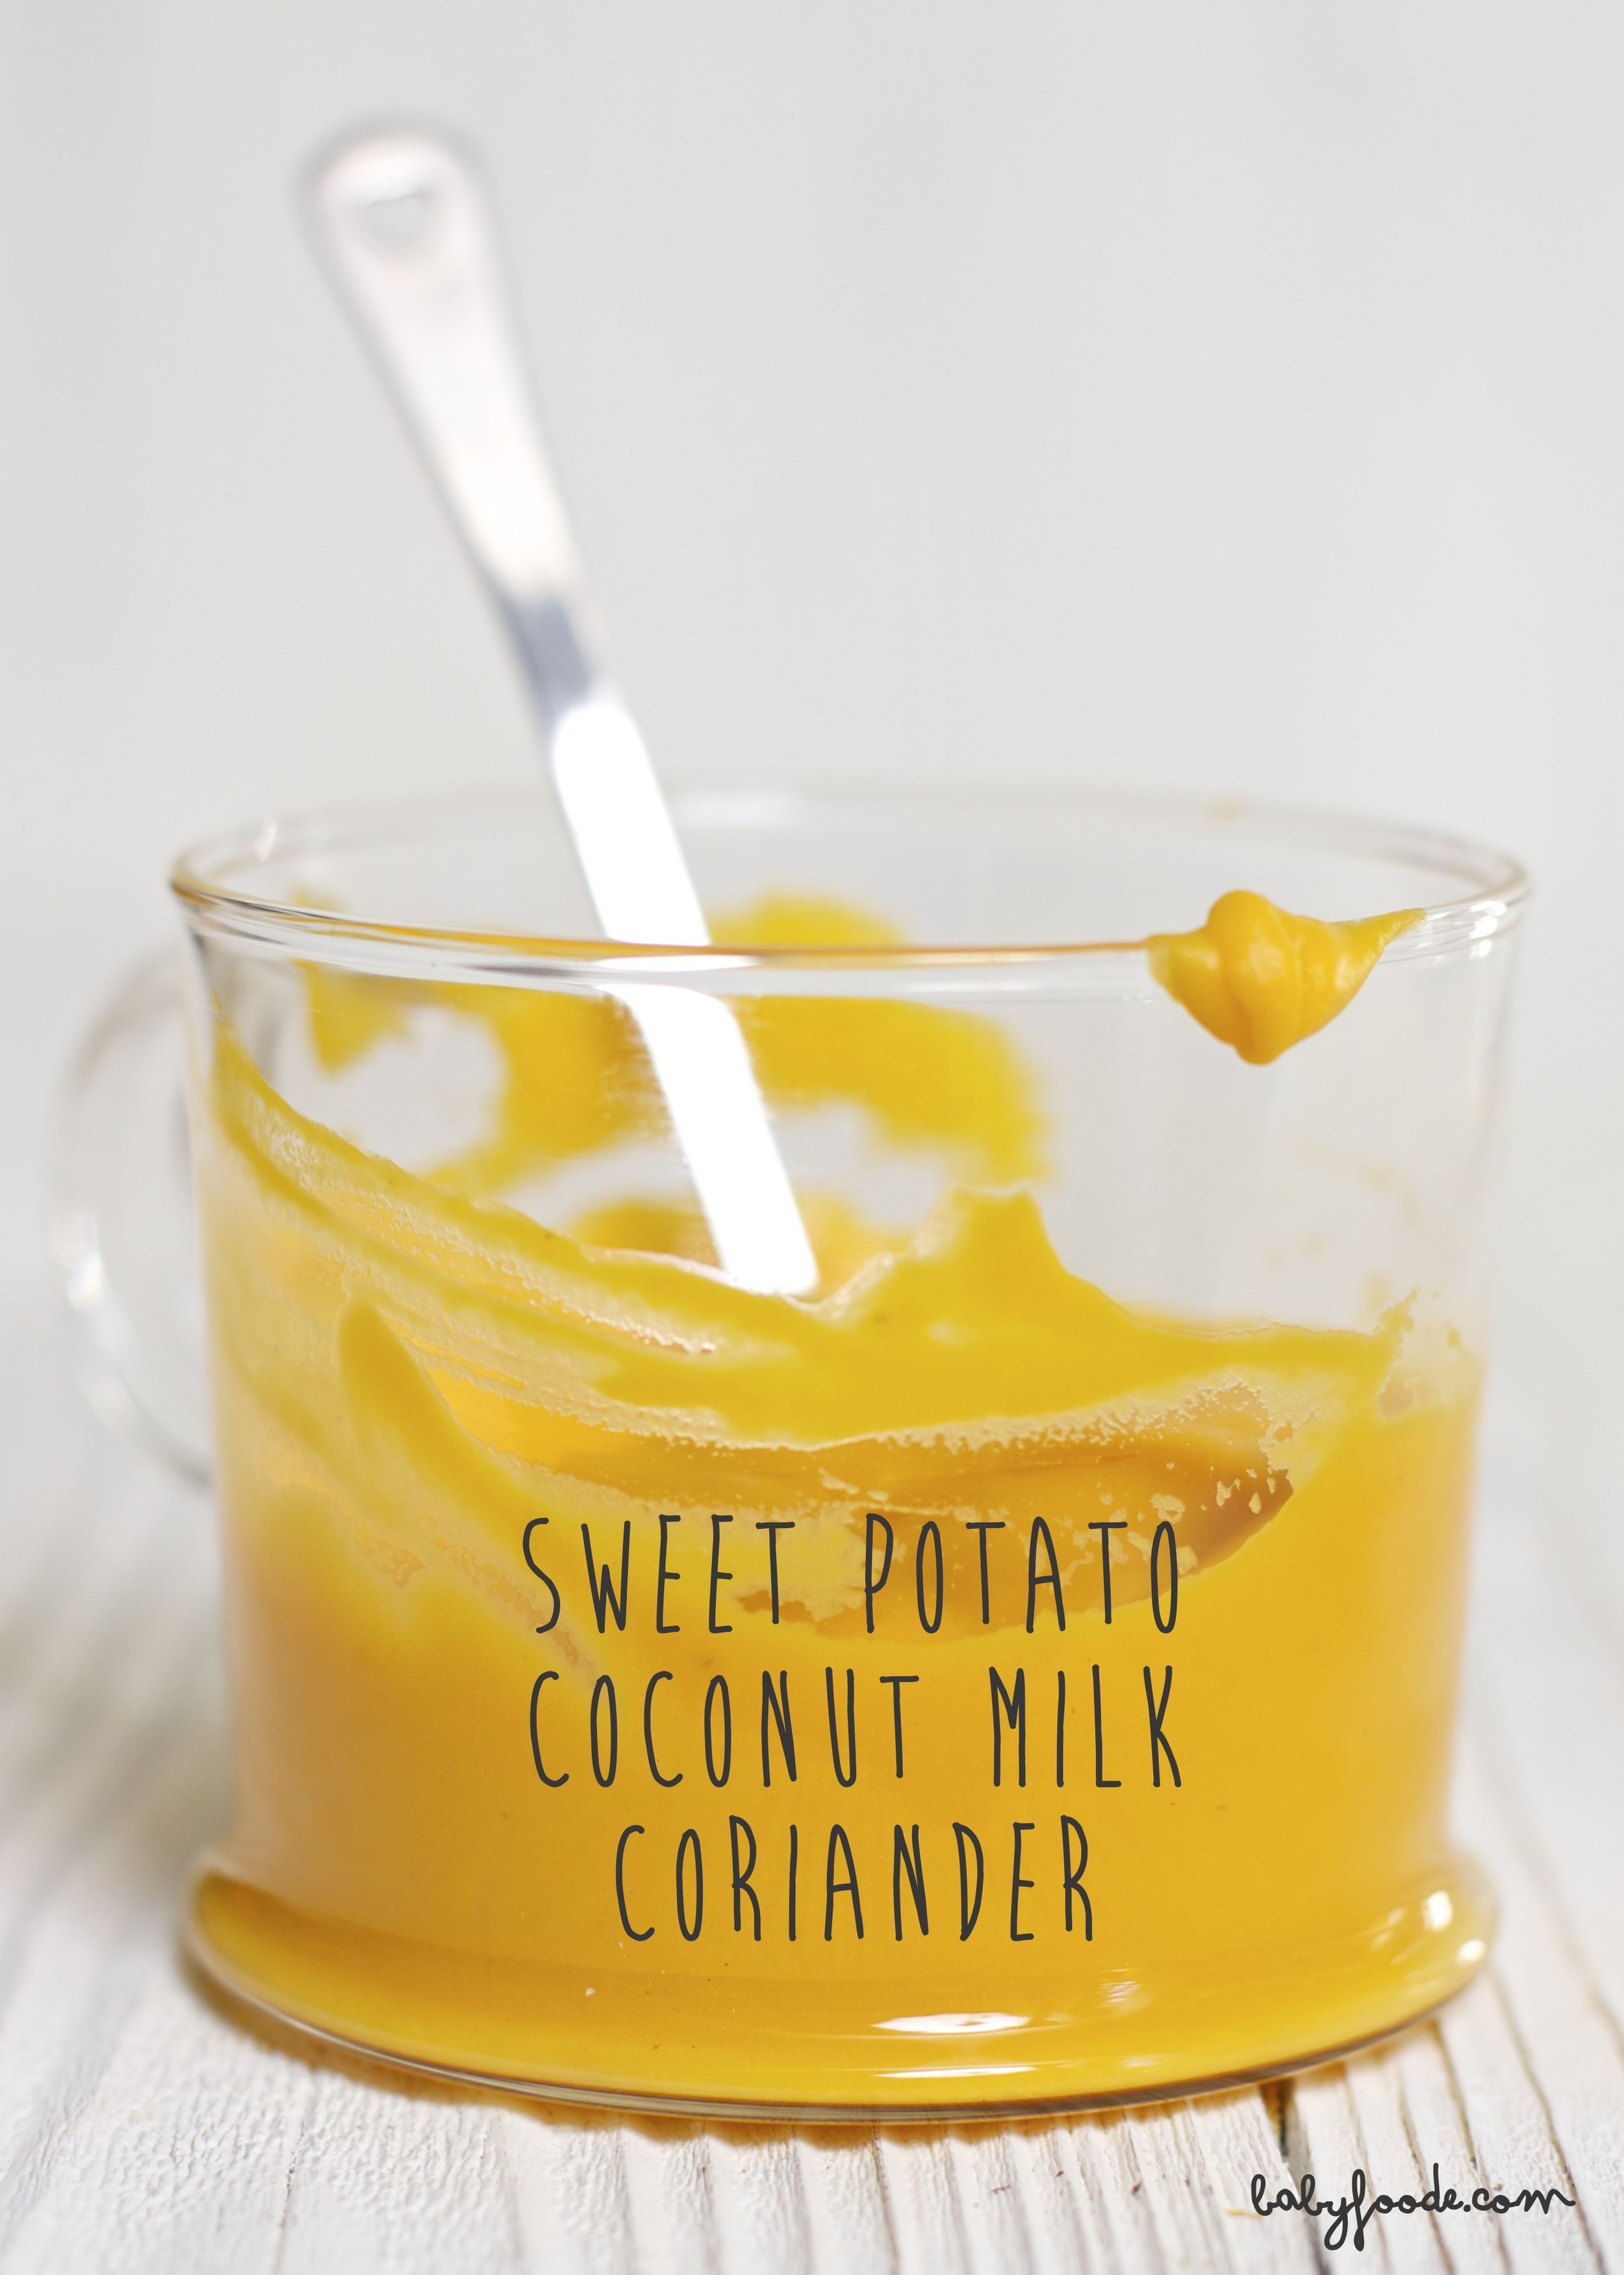 Sweet potato coconut milk coriander baby food puree recipe sweet potato coconut milk coriander puree baby foode organic baby food recipes forumfinder Image collections